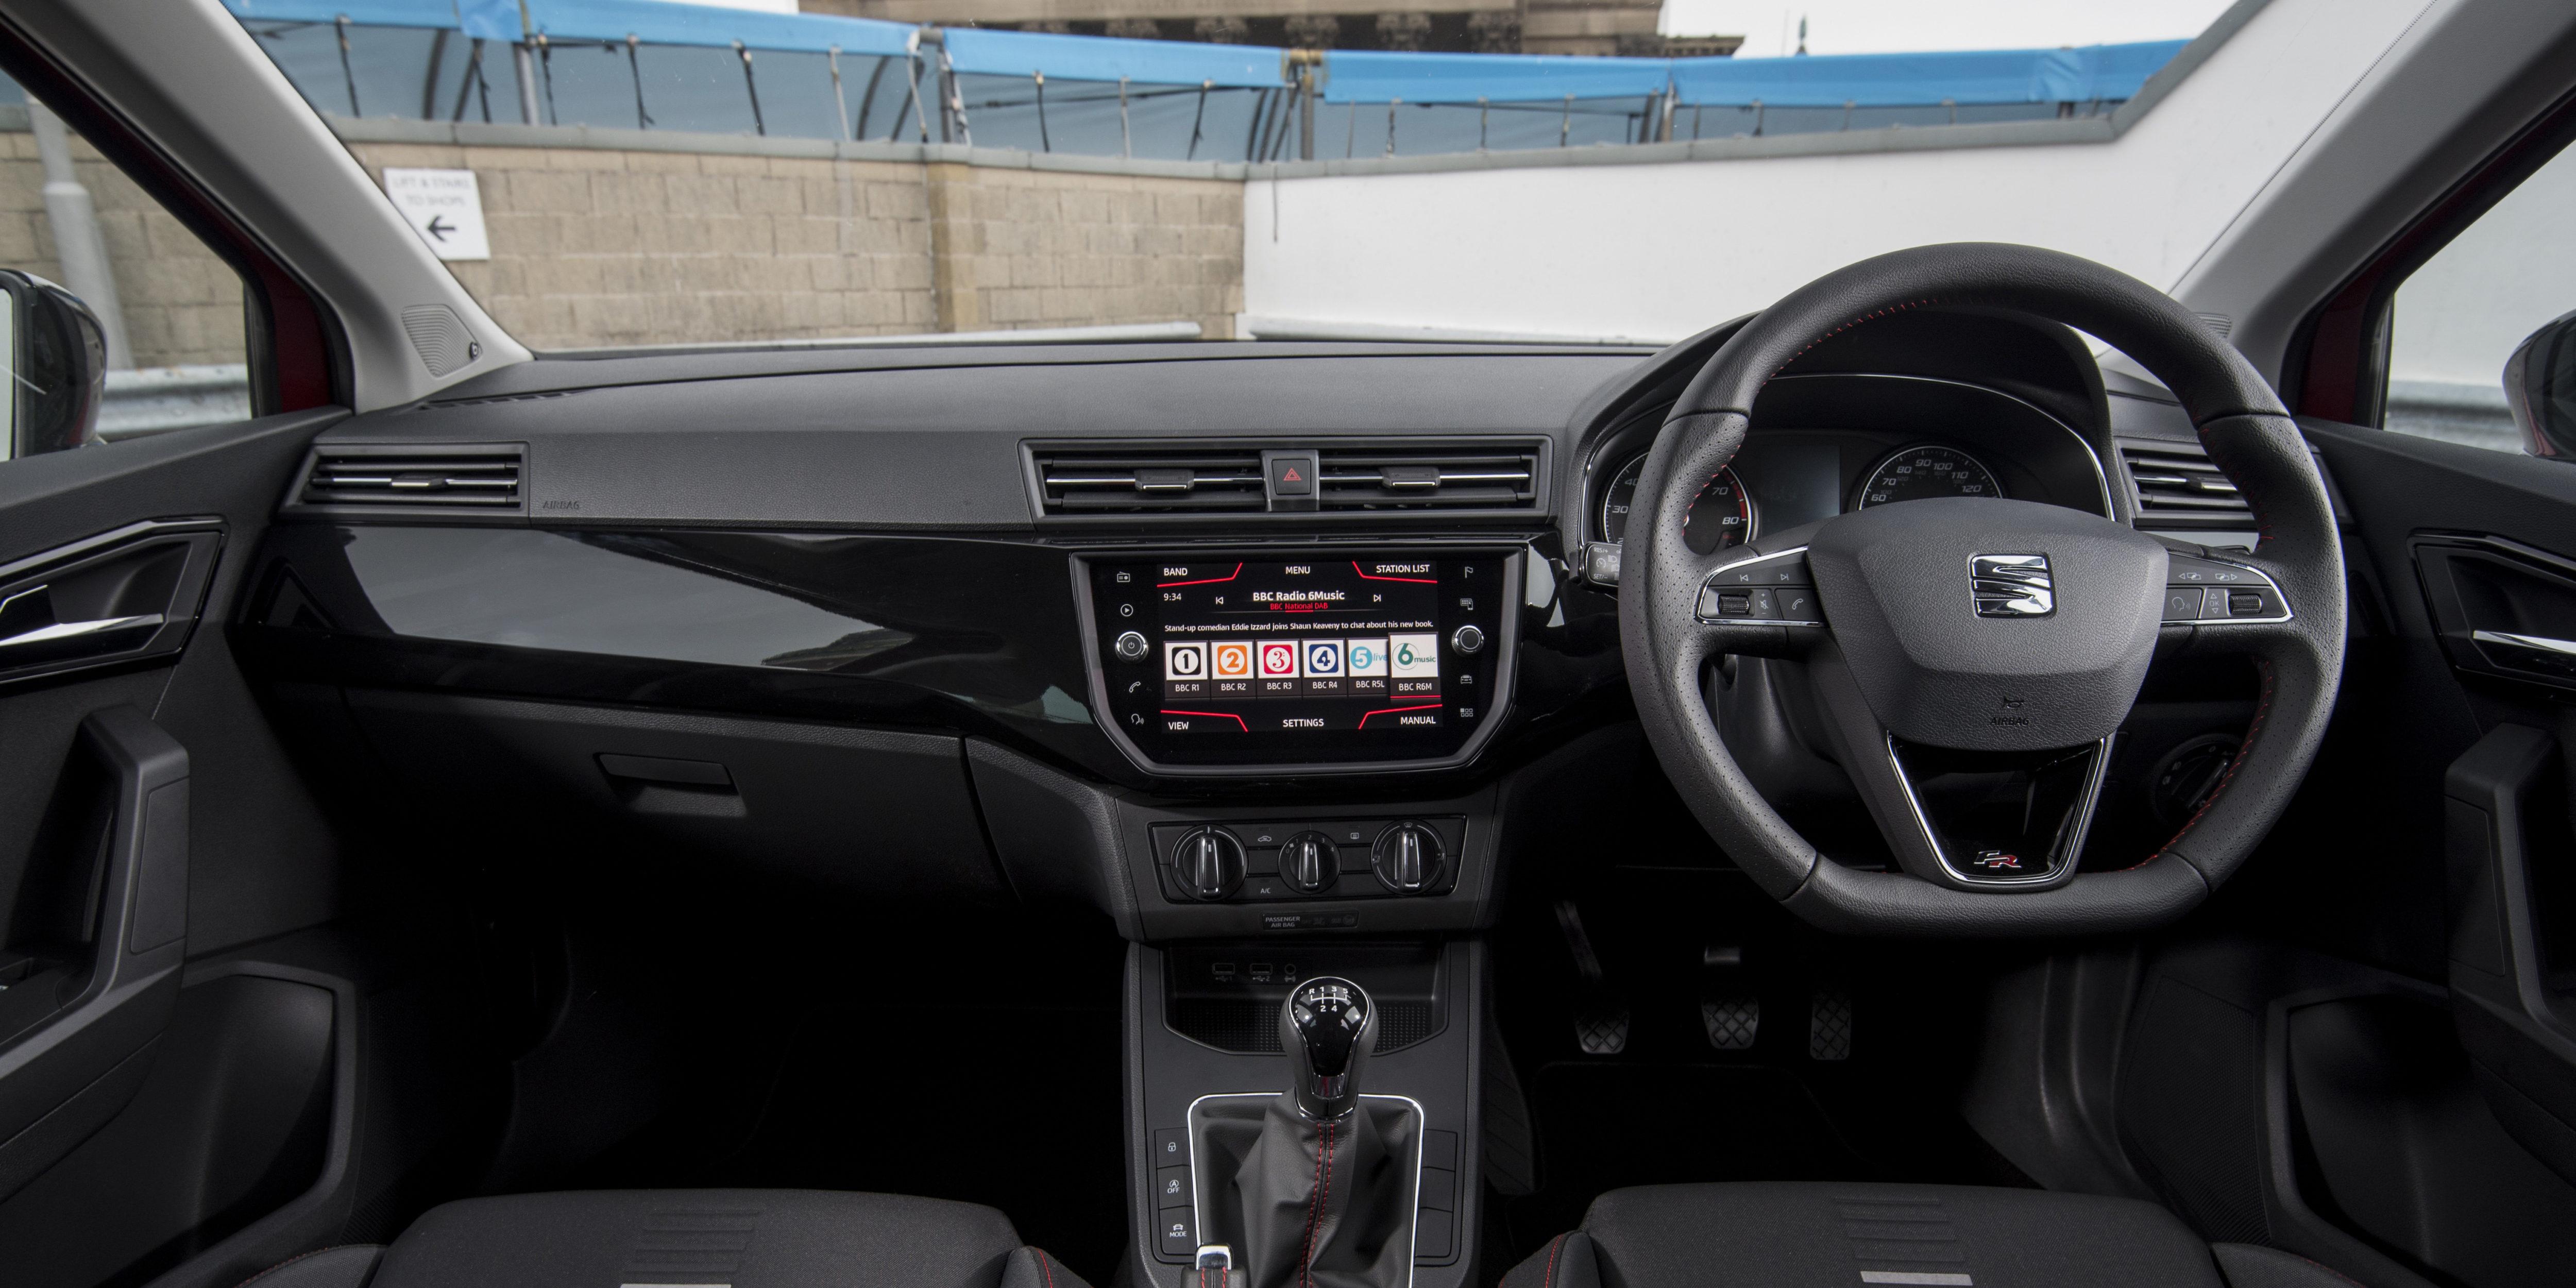 Seat Ibiza 1,2 TSI FR -Testbericht